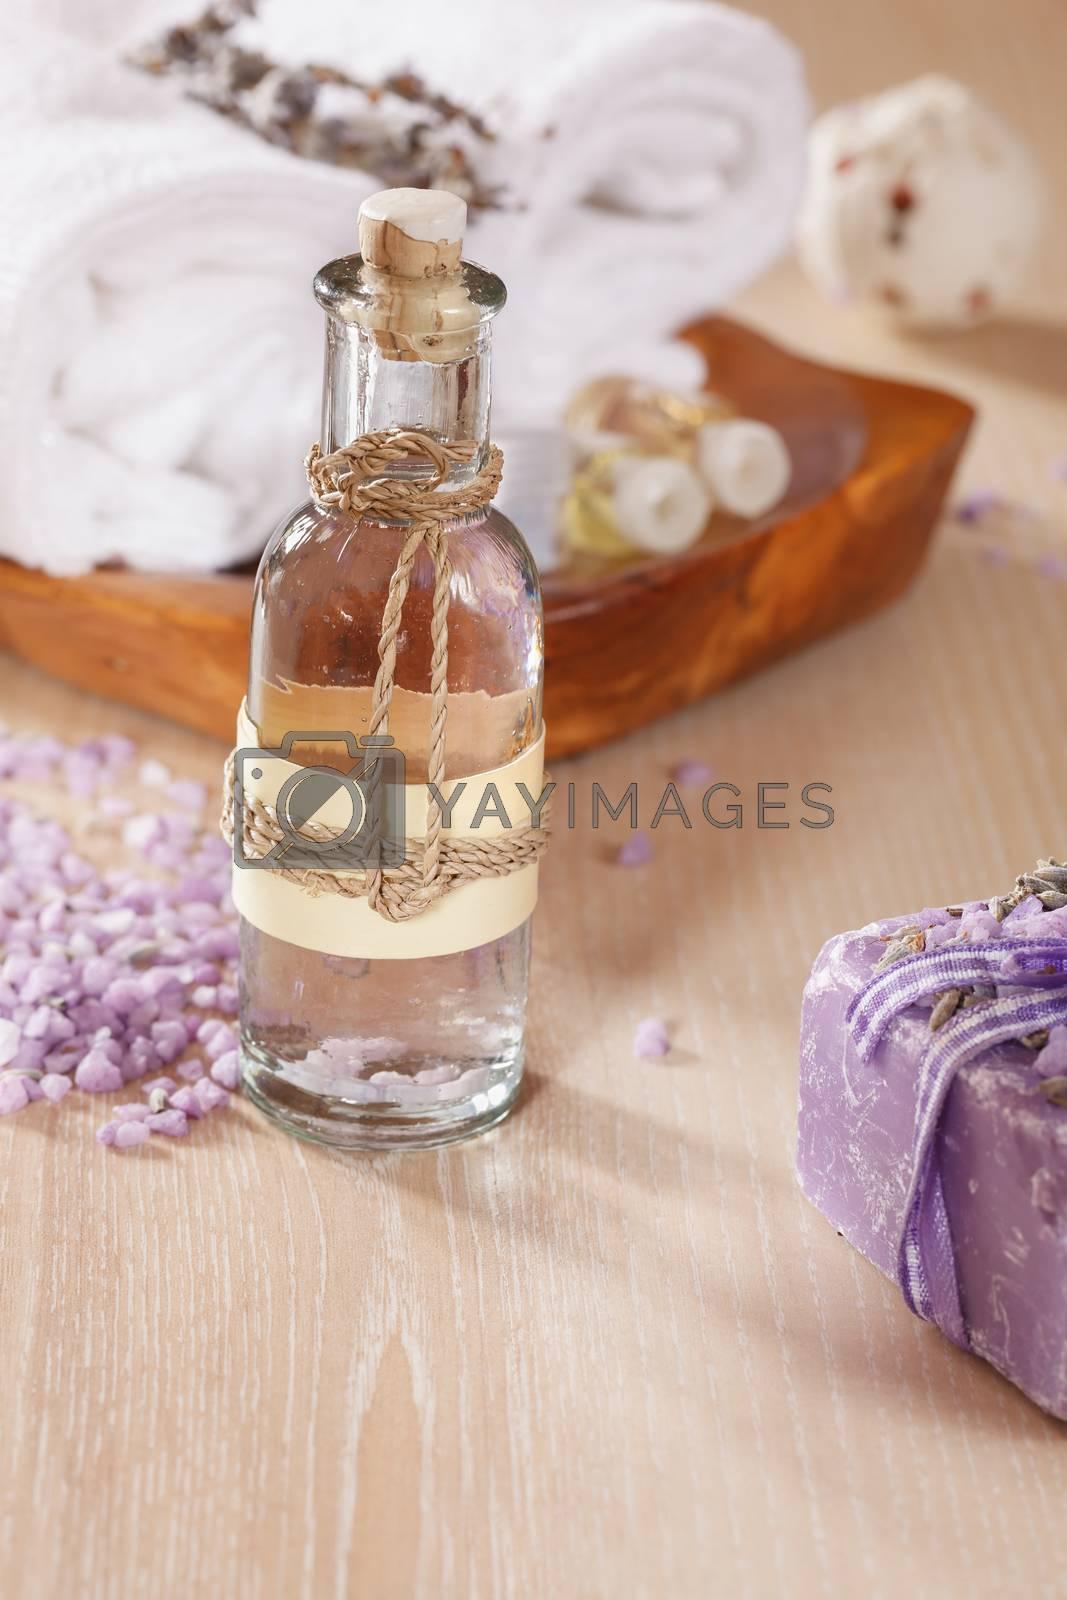 Lavender spa treatment. by Slast20